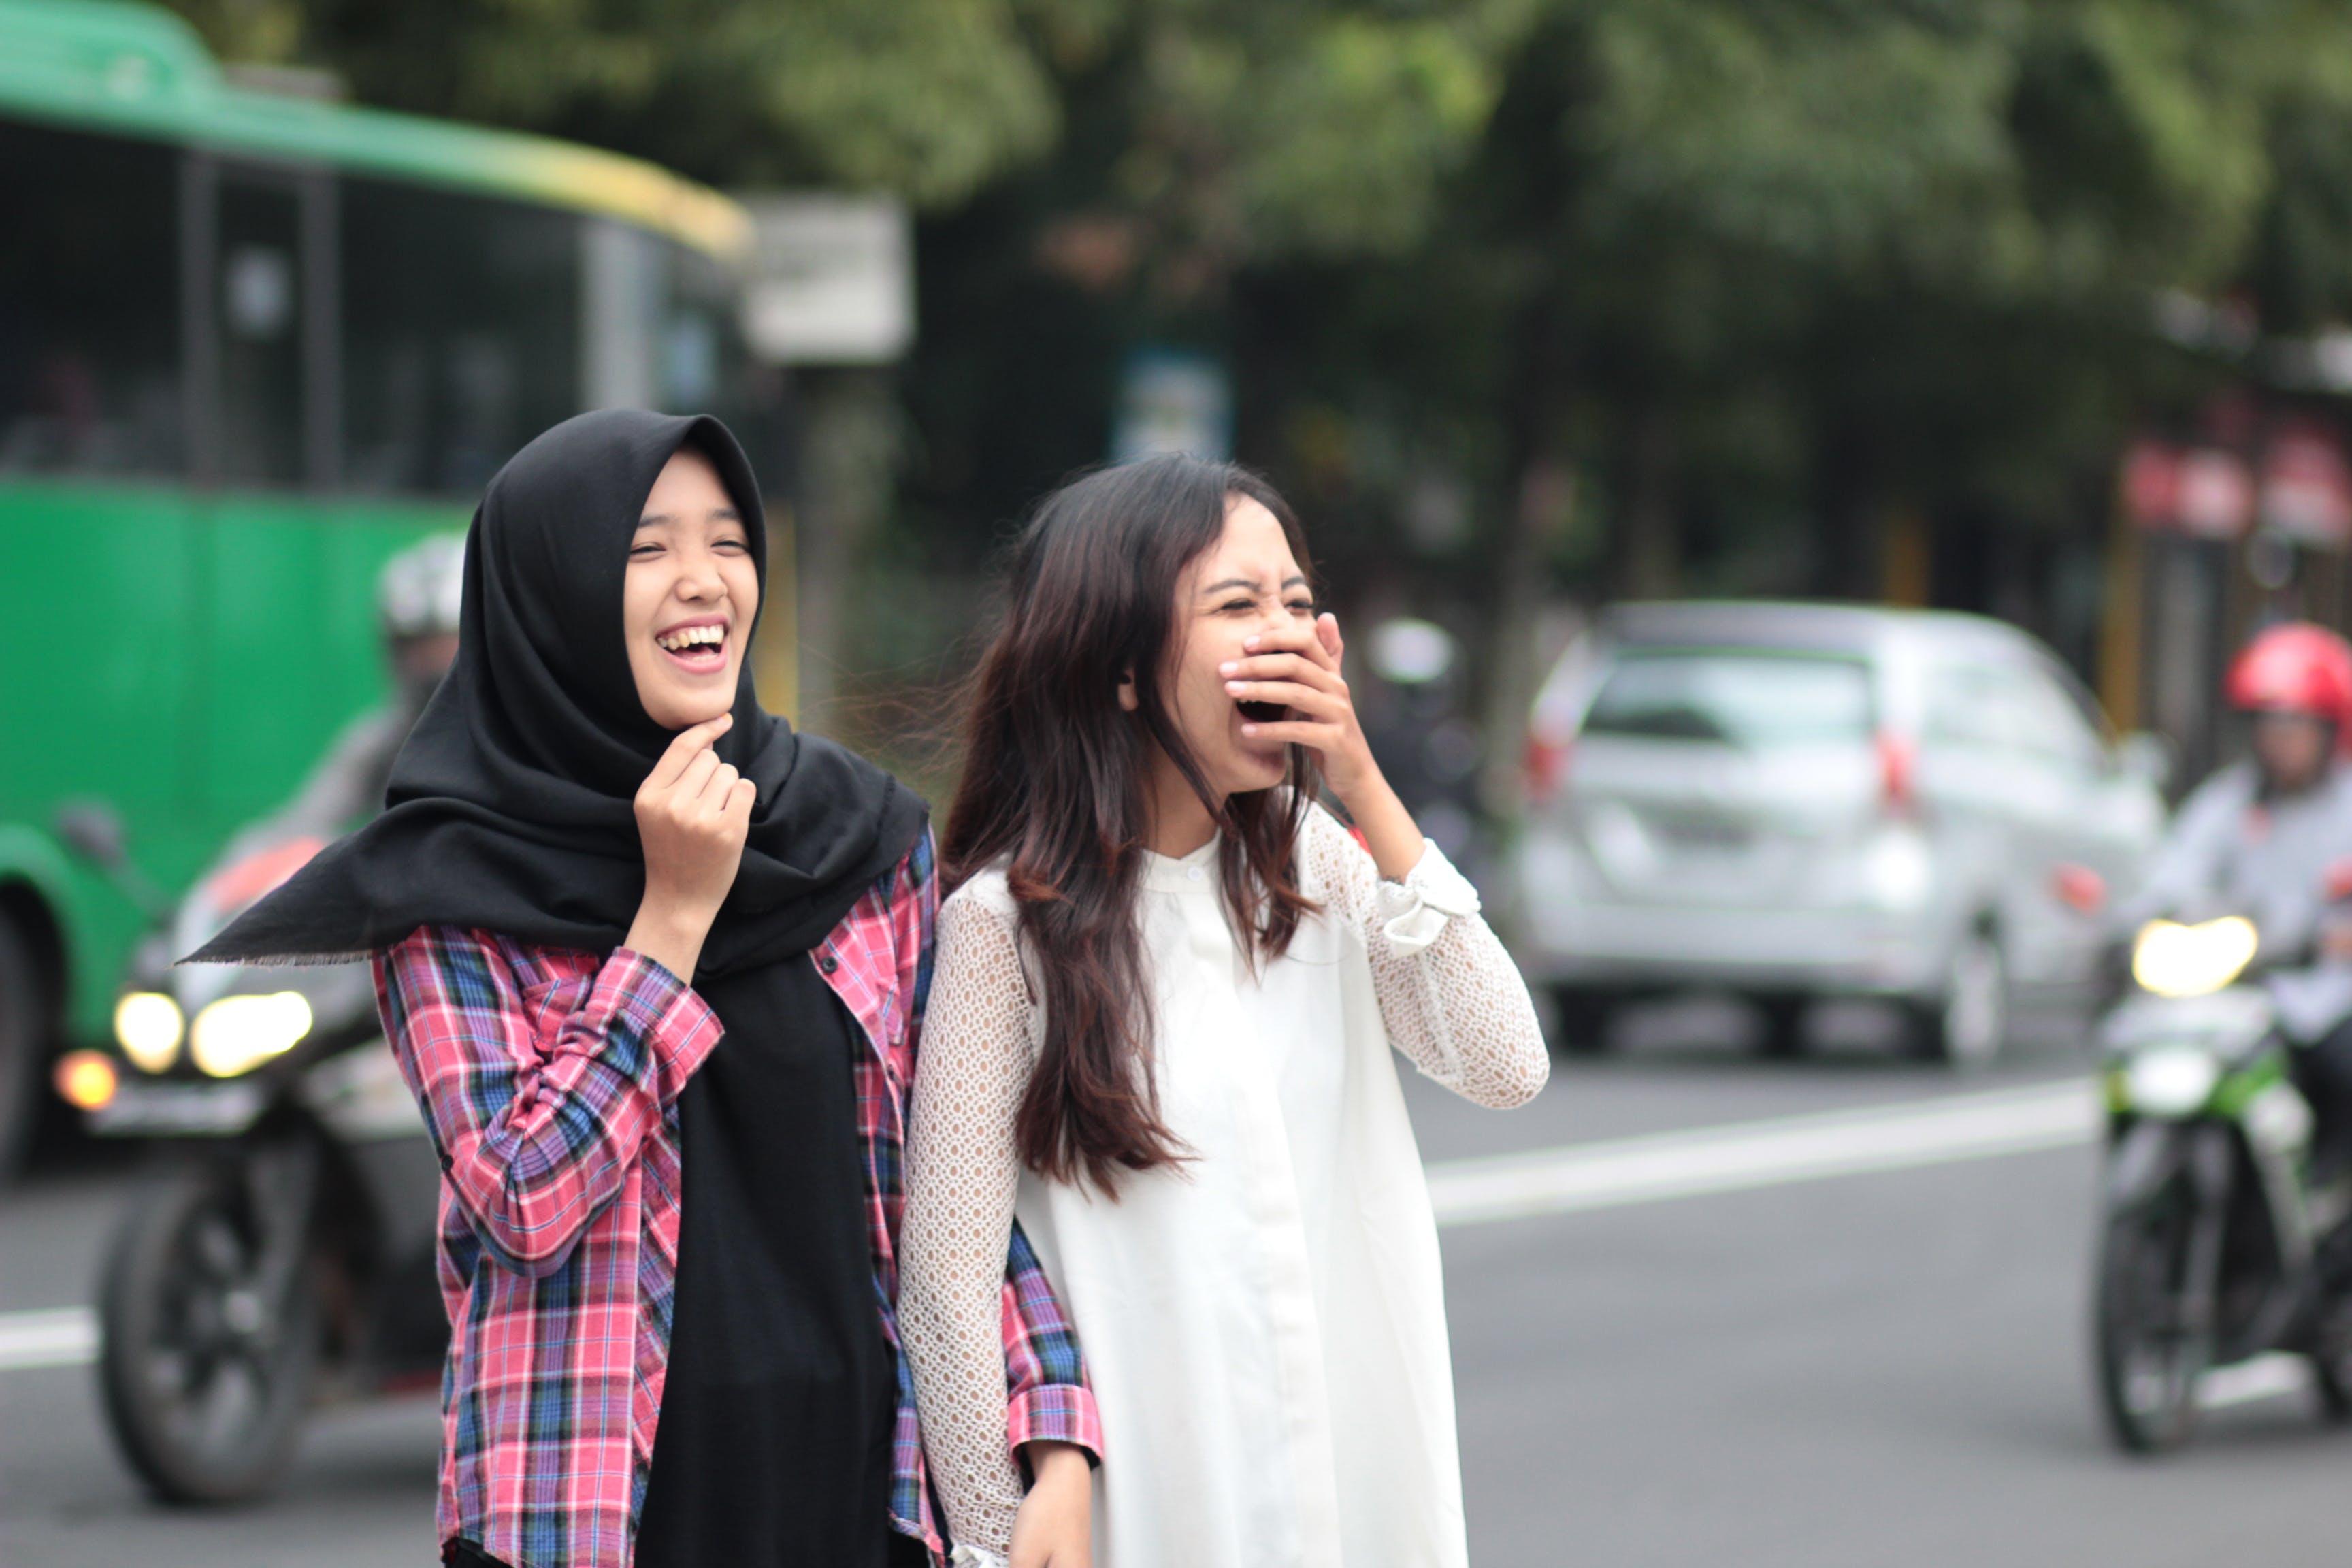 Two Women Laughing at Street